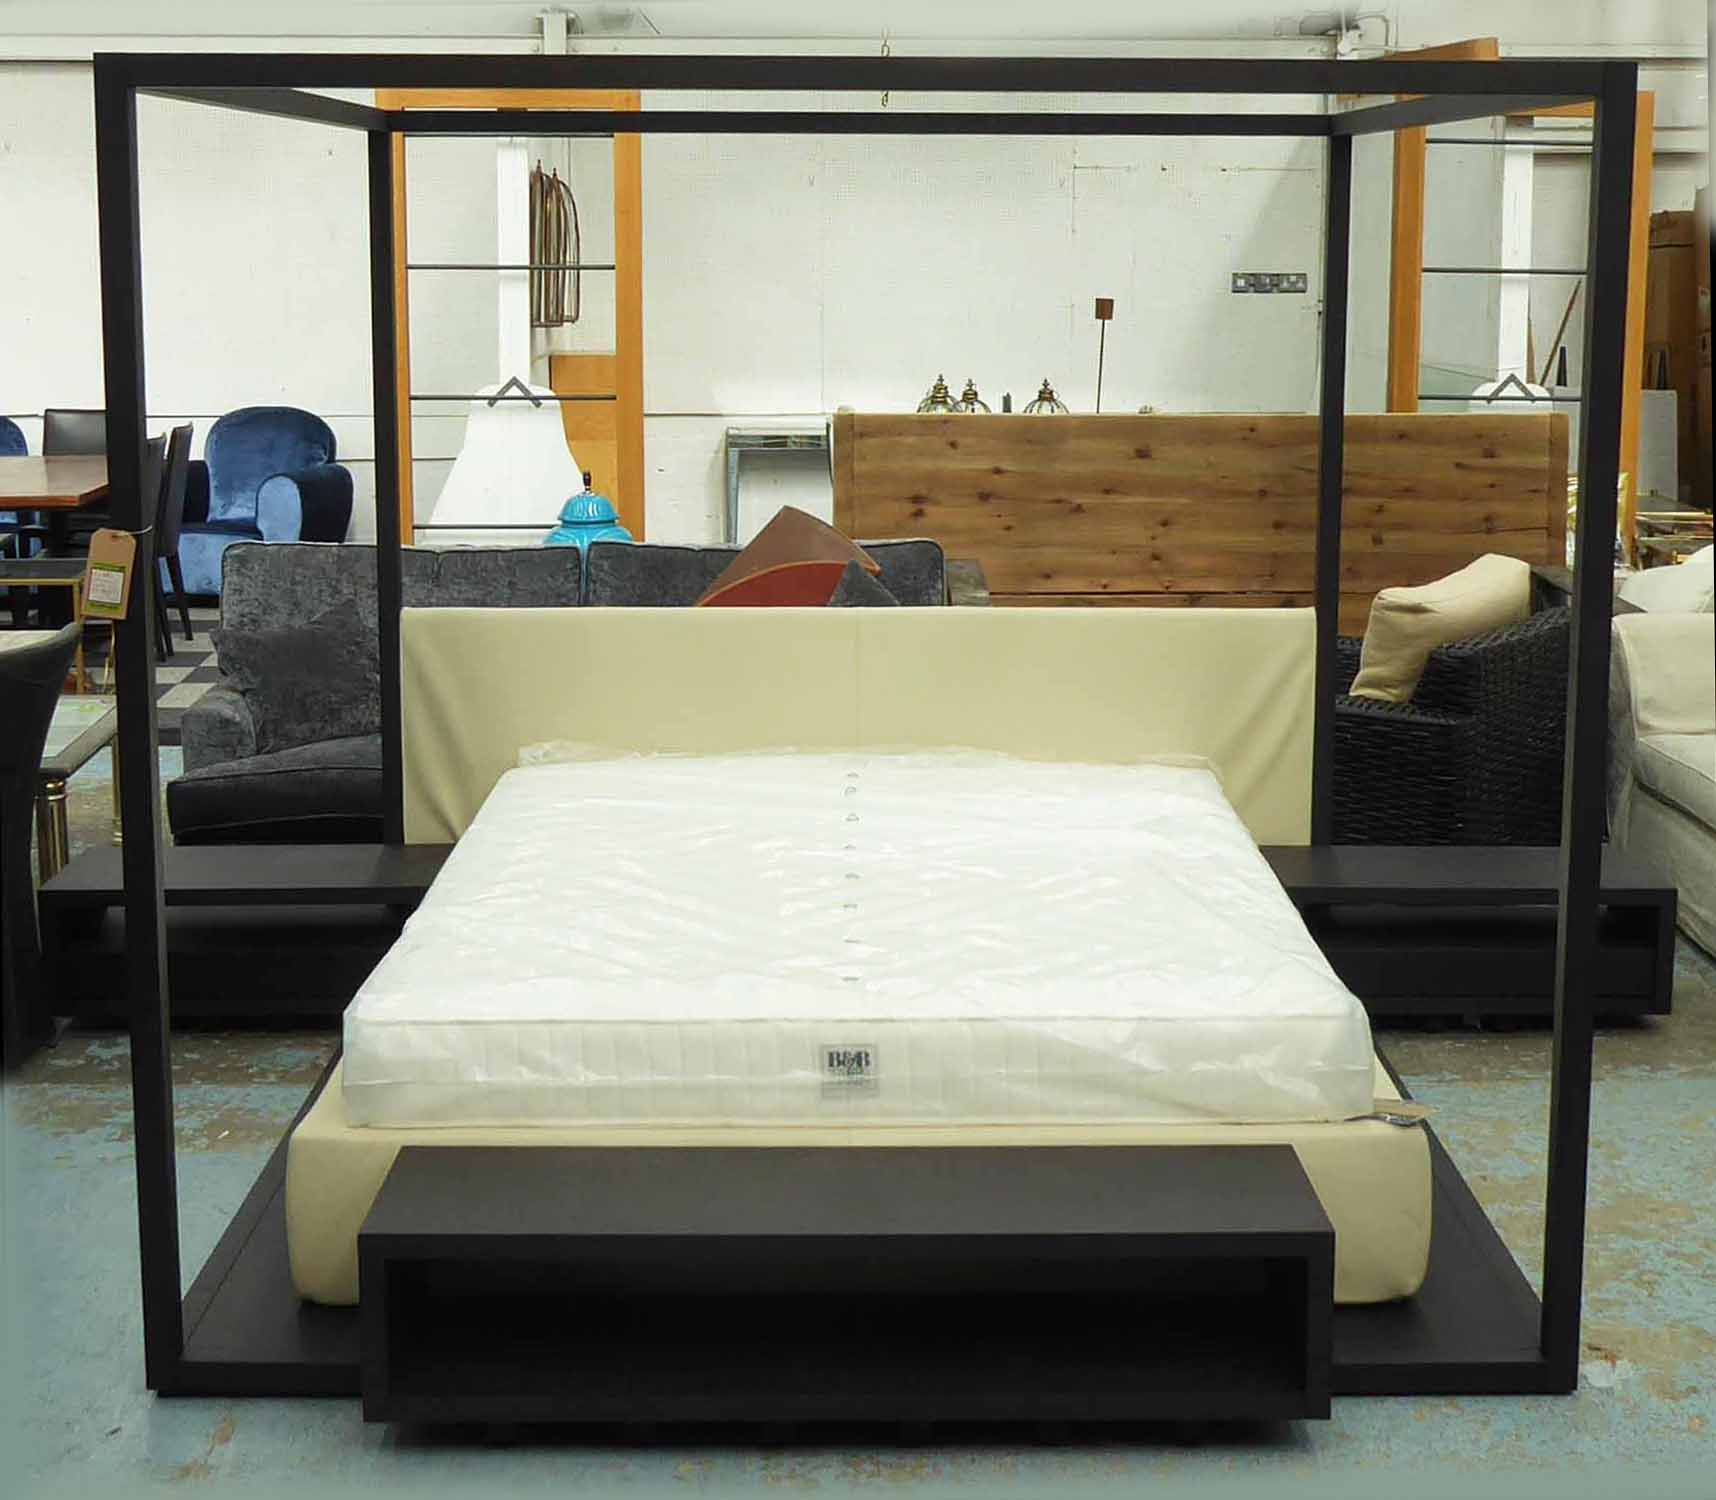 Lot 47 - B&B ITALIA WITH MAXALTO ALCOVA BED, by Antonio Citterio, with B&B Italia Mattress,